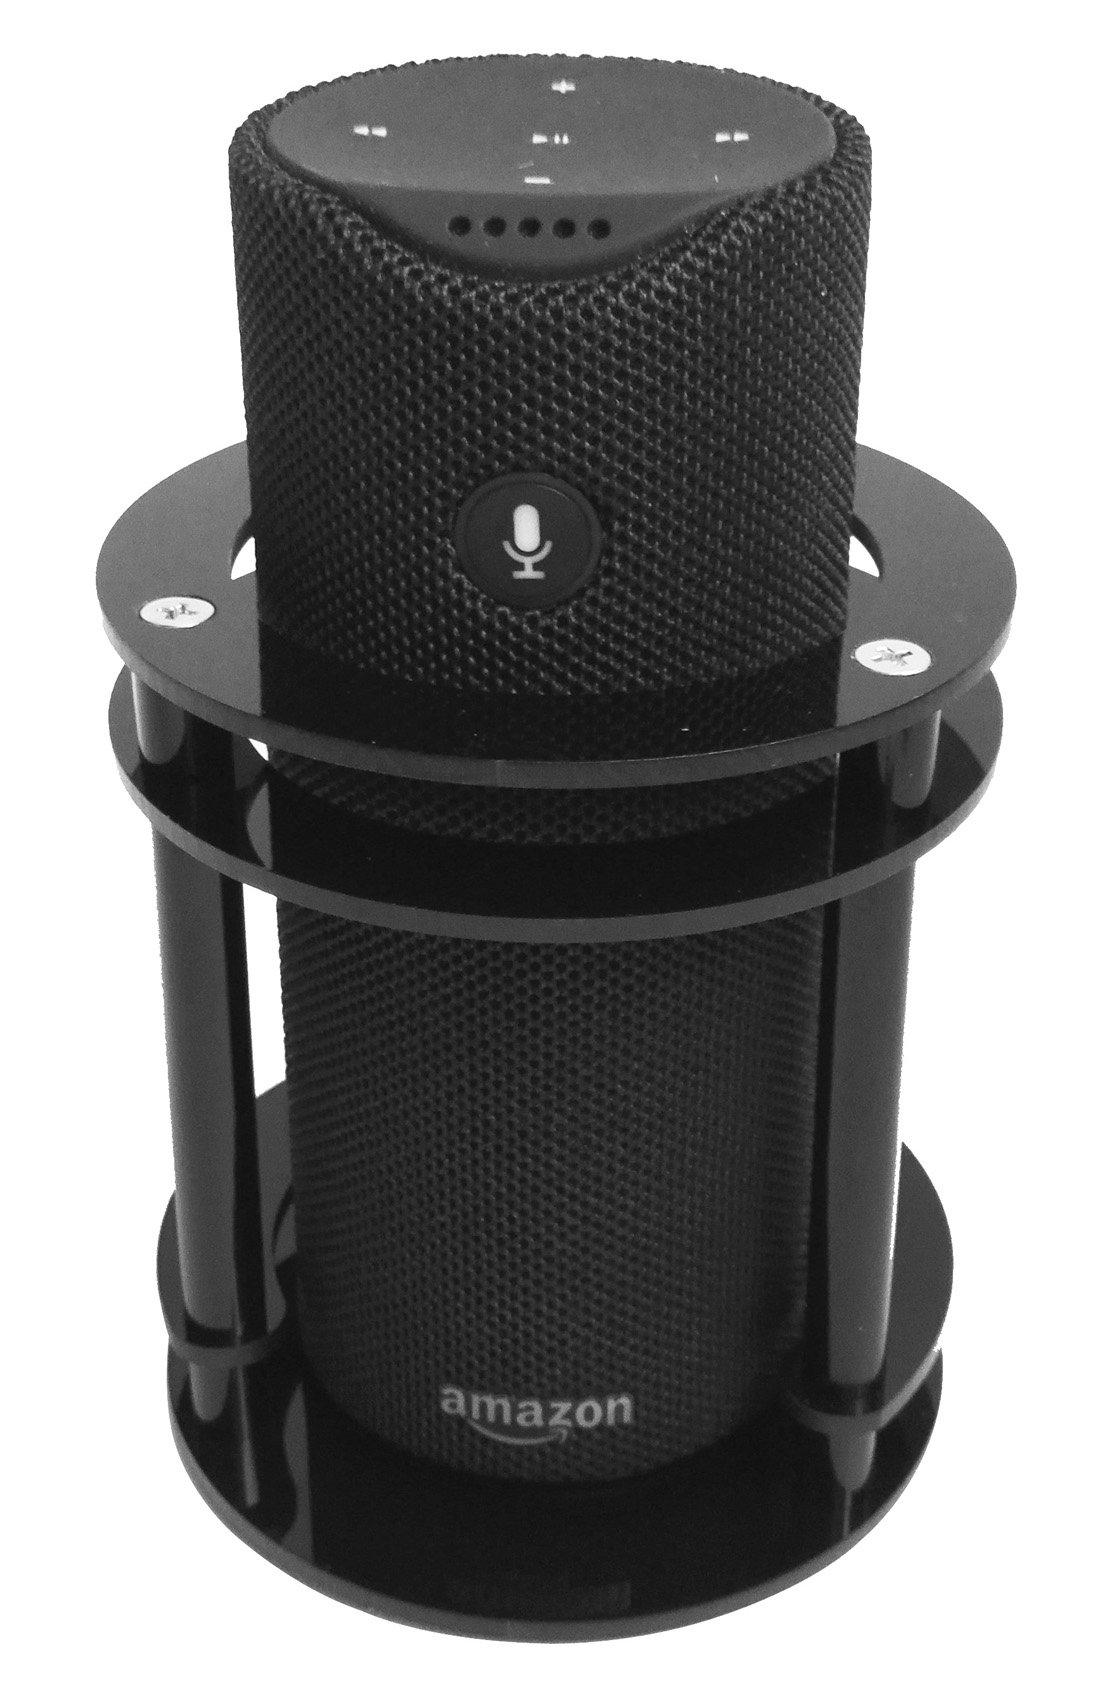 FitSand(TM Speaker Guard Stand Station Holder for Amazon Tap - Black